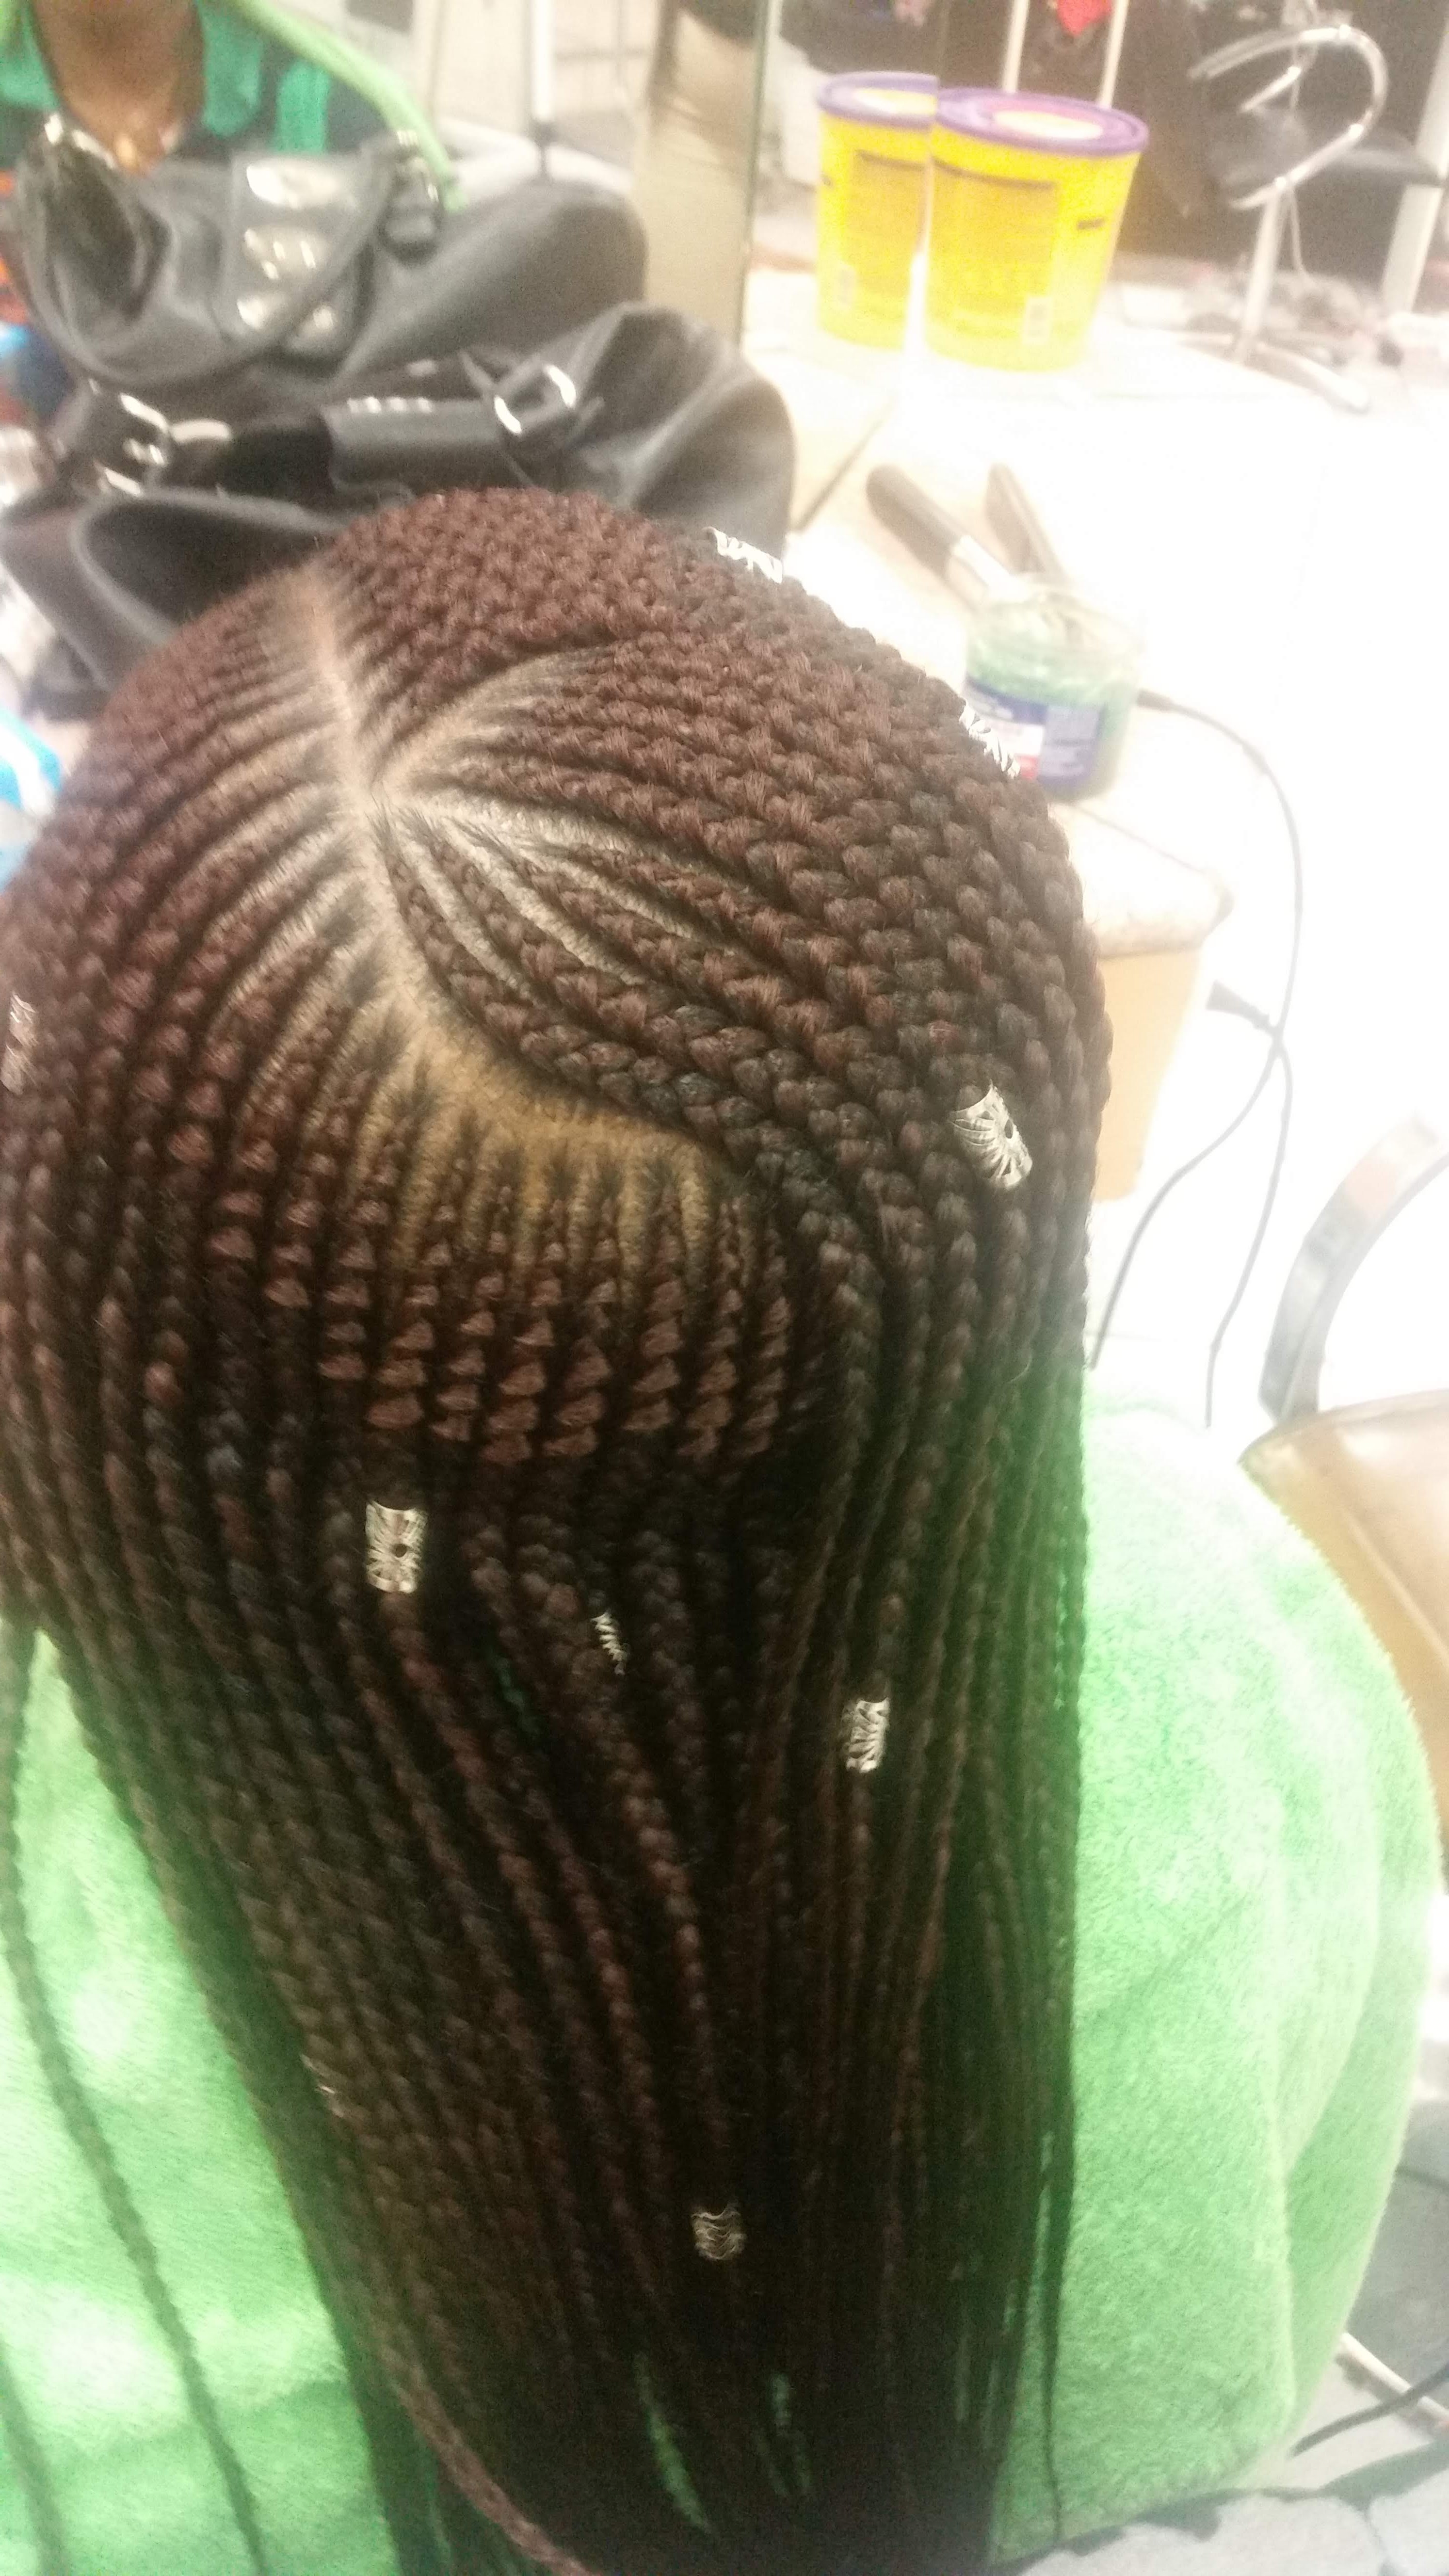 salon de coiffure afro tresse tresses box braids crochet braids vanilles tissages paris 75 77 78 91 92 93 94 95 CJHQLNKA